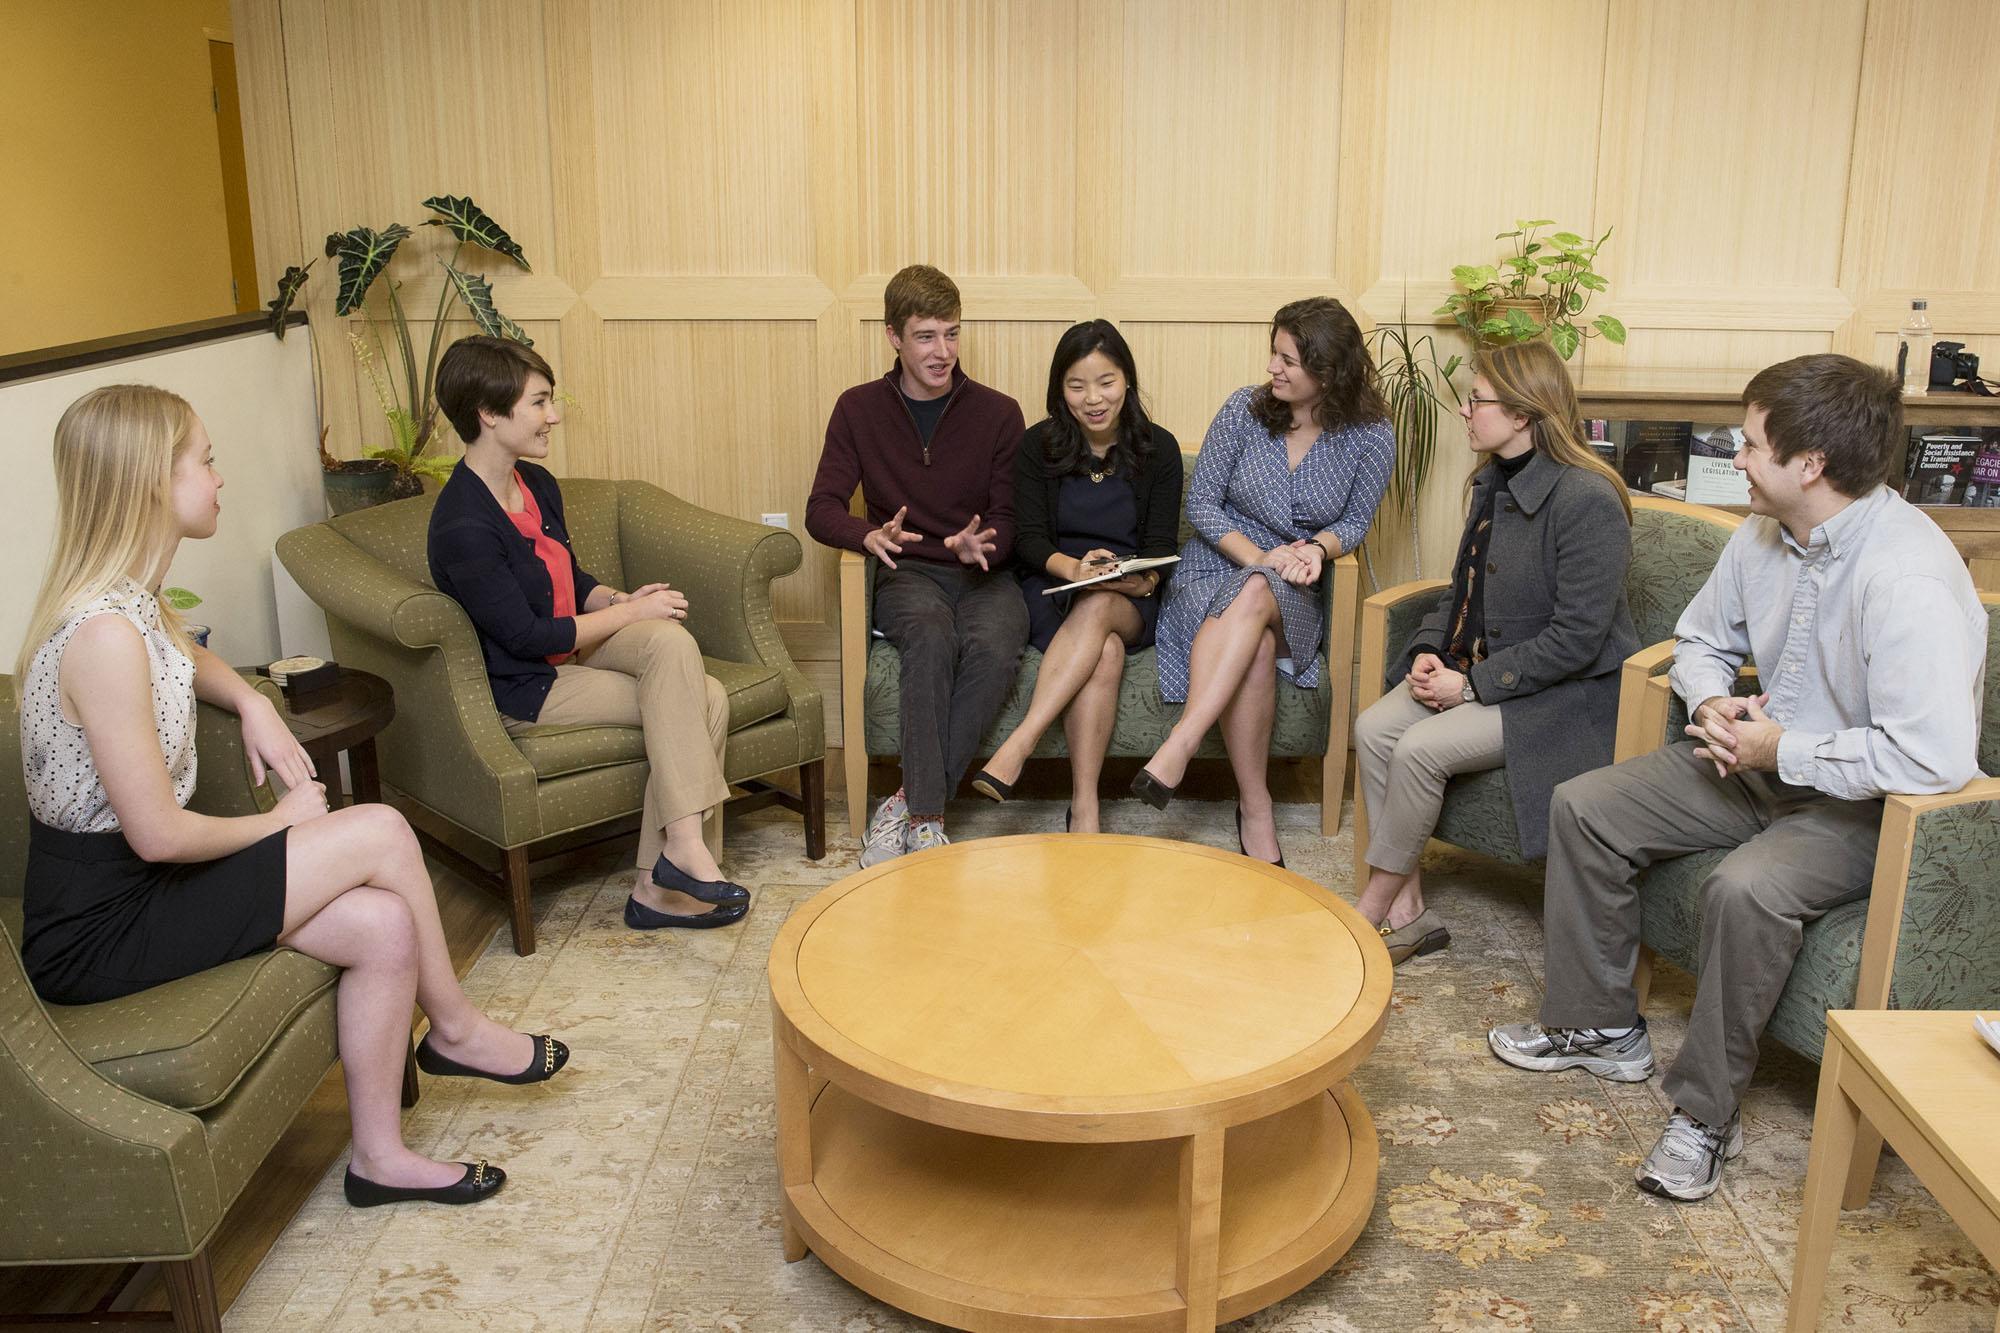 FCG team leaders from left to right: Lauren Kinneberg, Catherine Quinn, Tyler Williams, Michelle Cho, Jacquelyn Katuin, Madeline Merrill and Corydon Baylor.